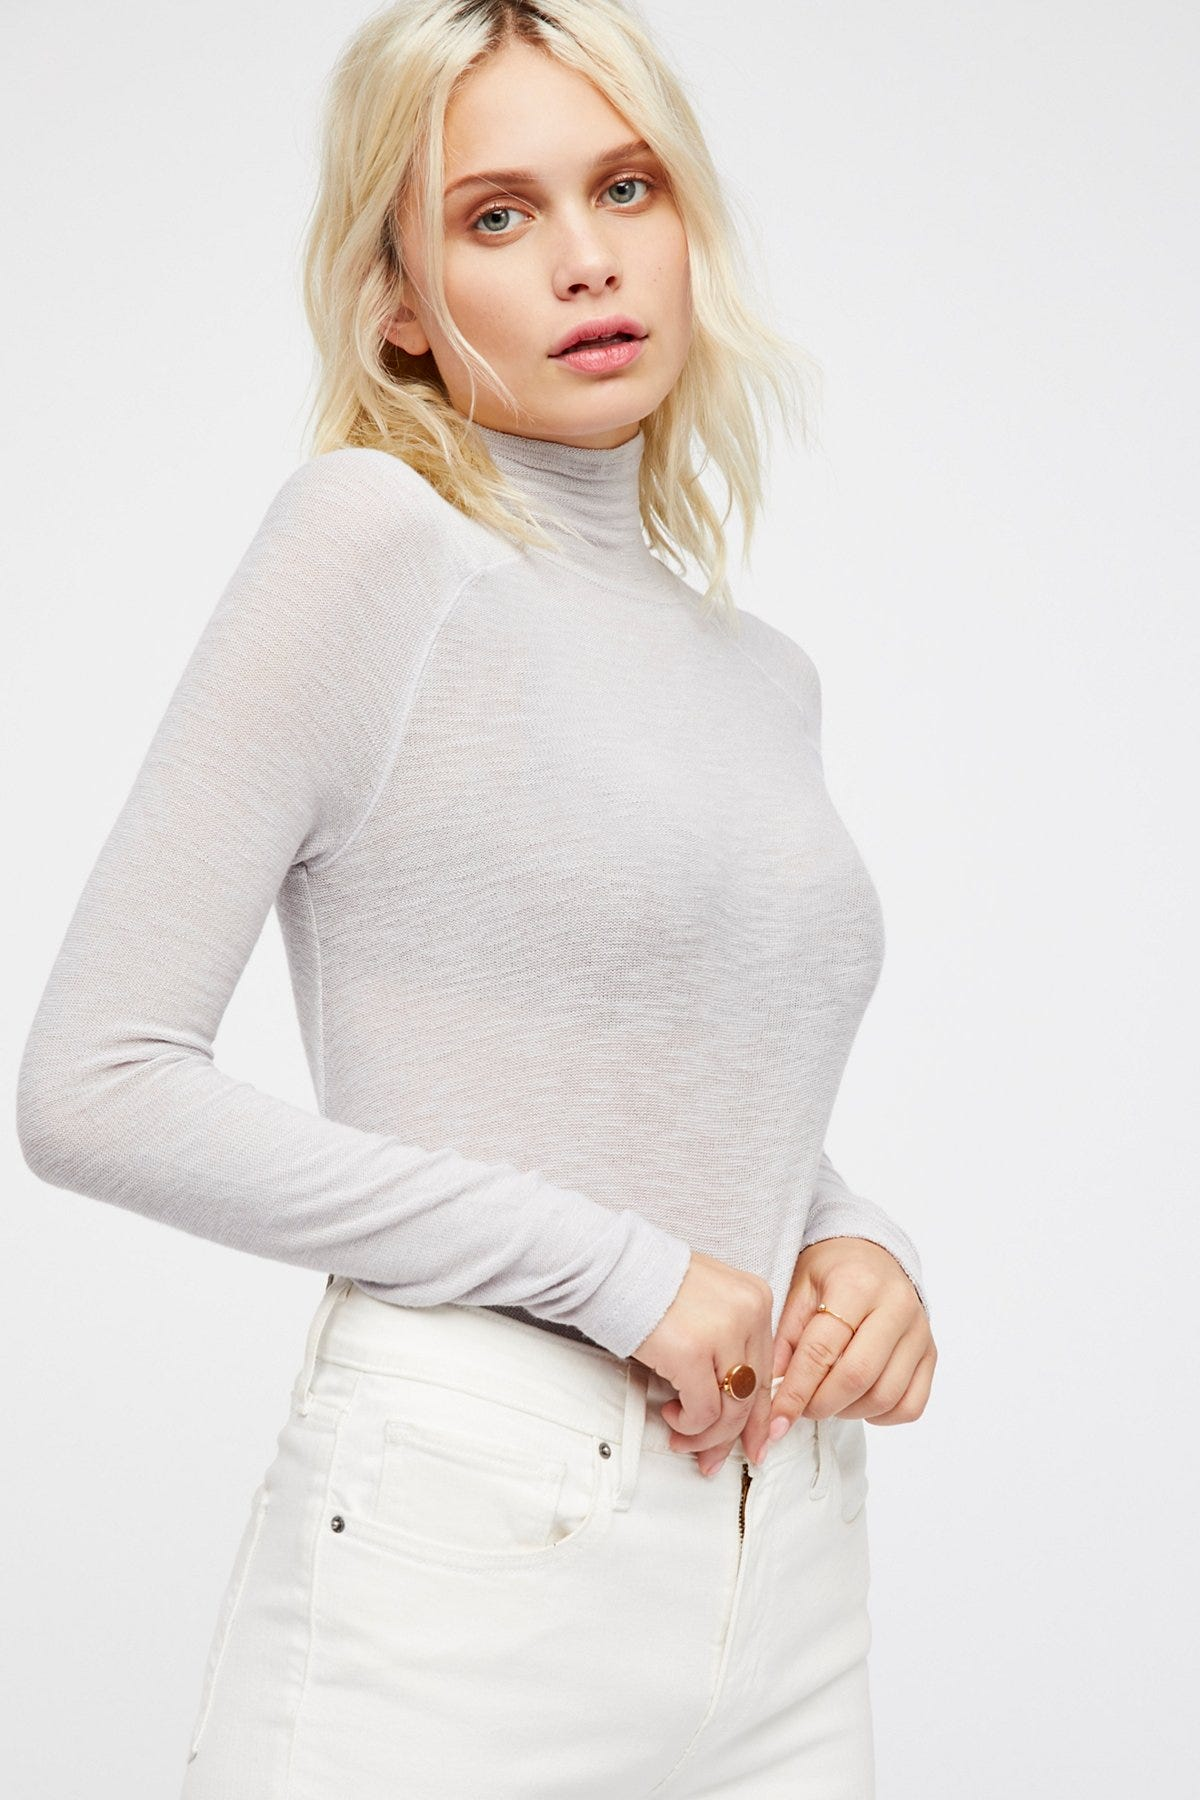 Over bent naked vagina